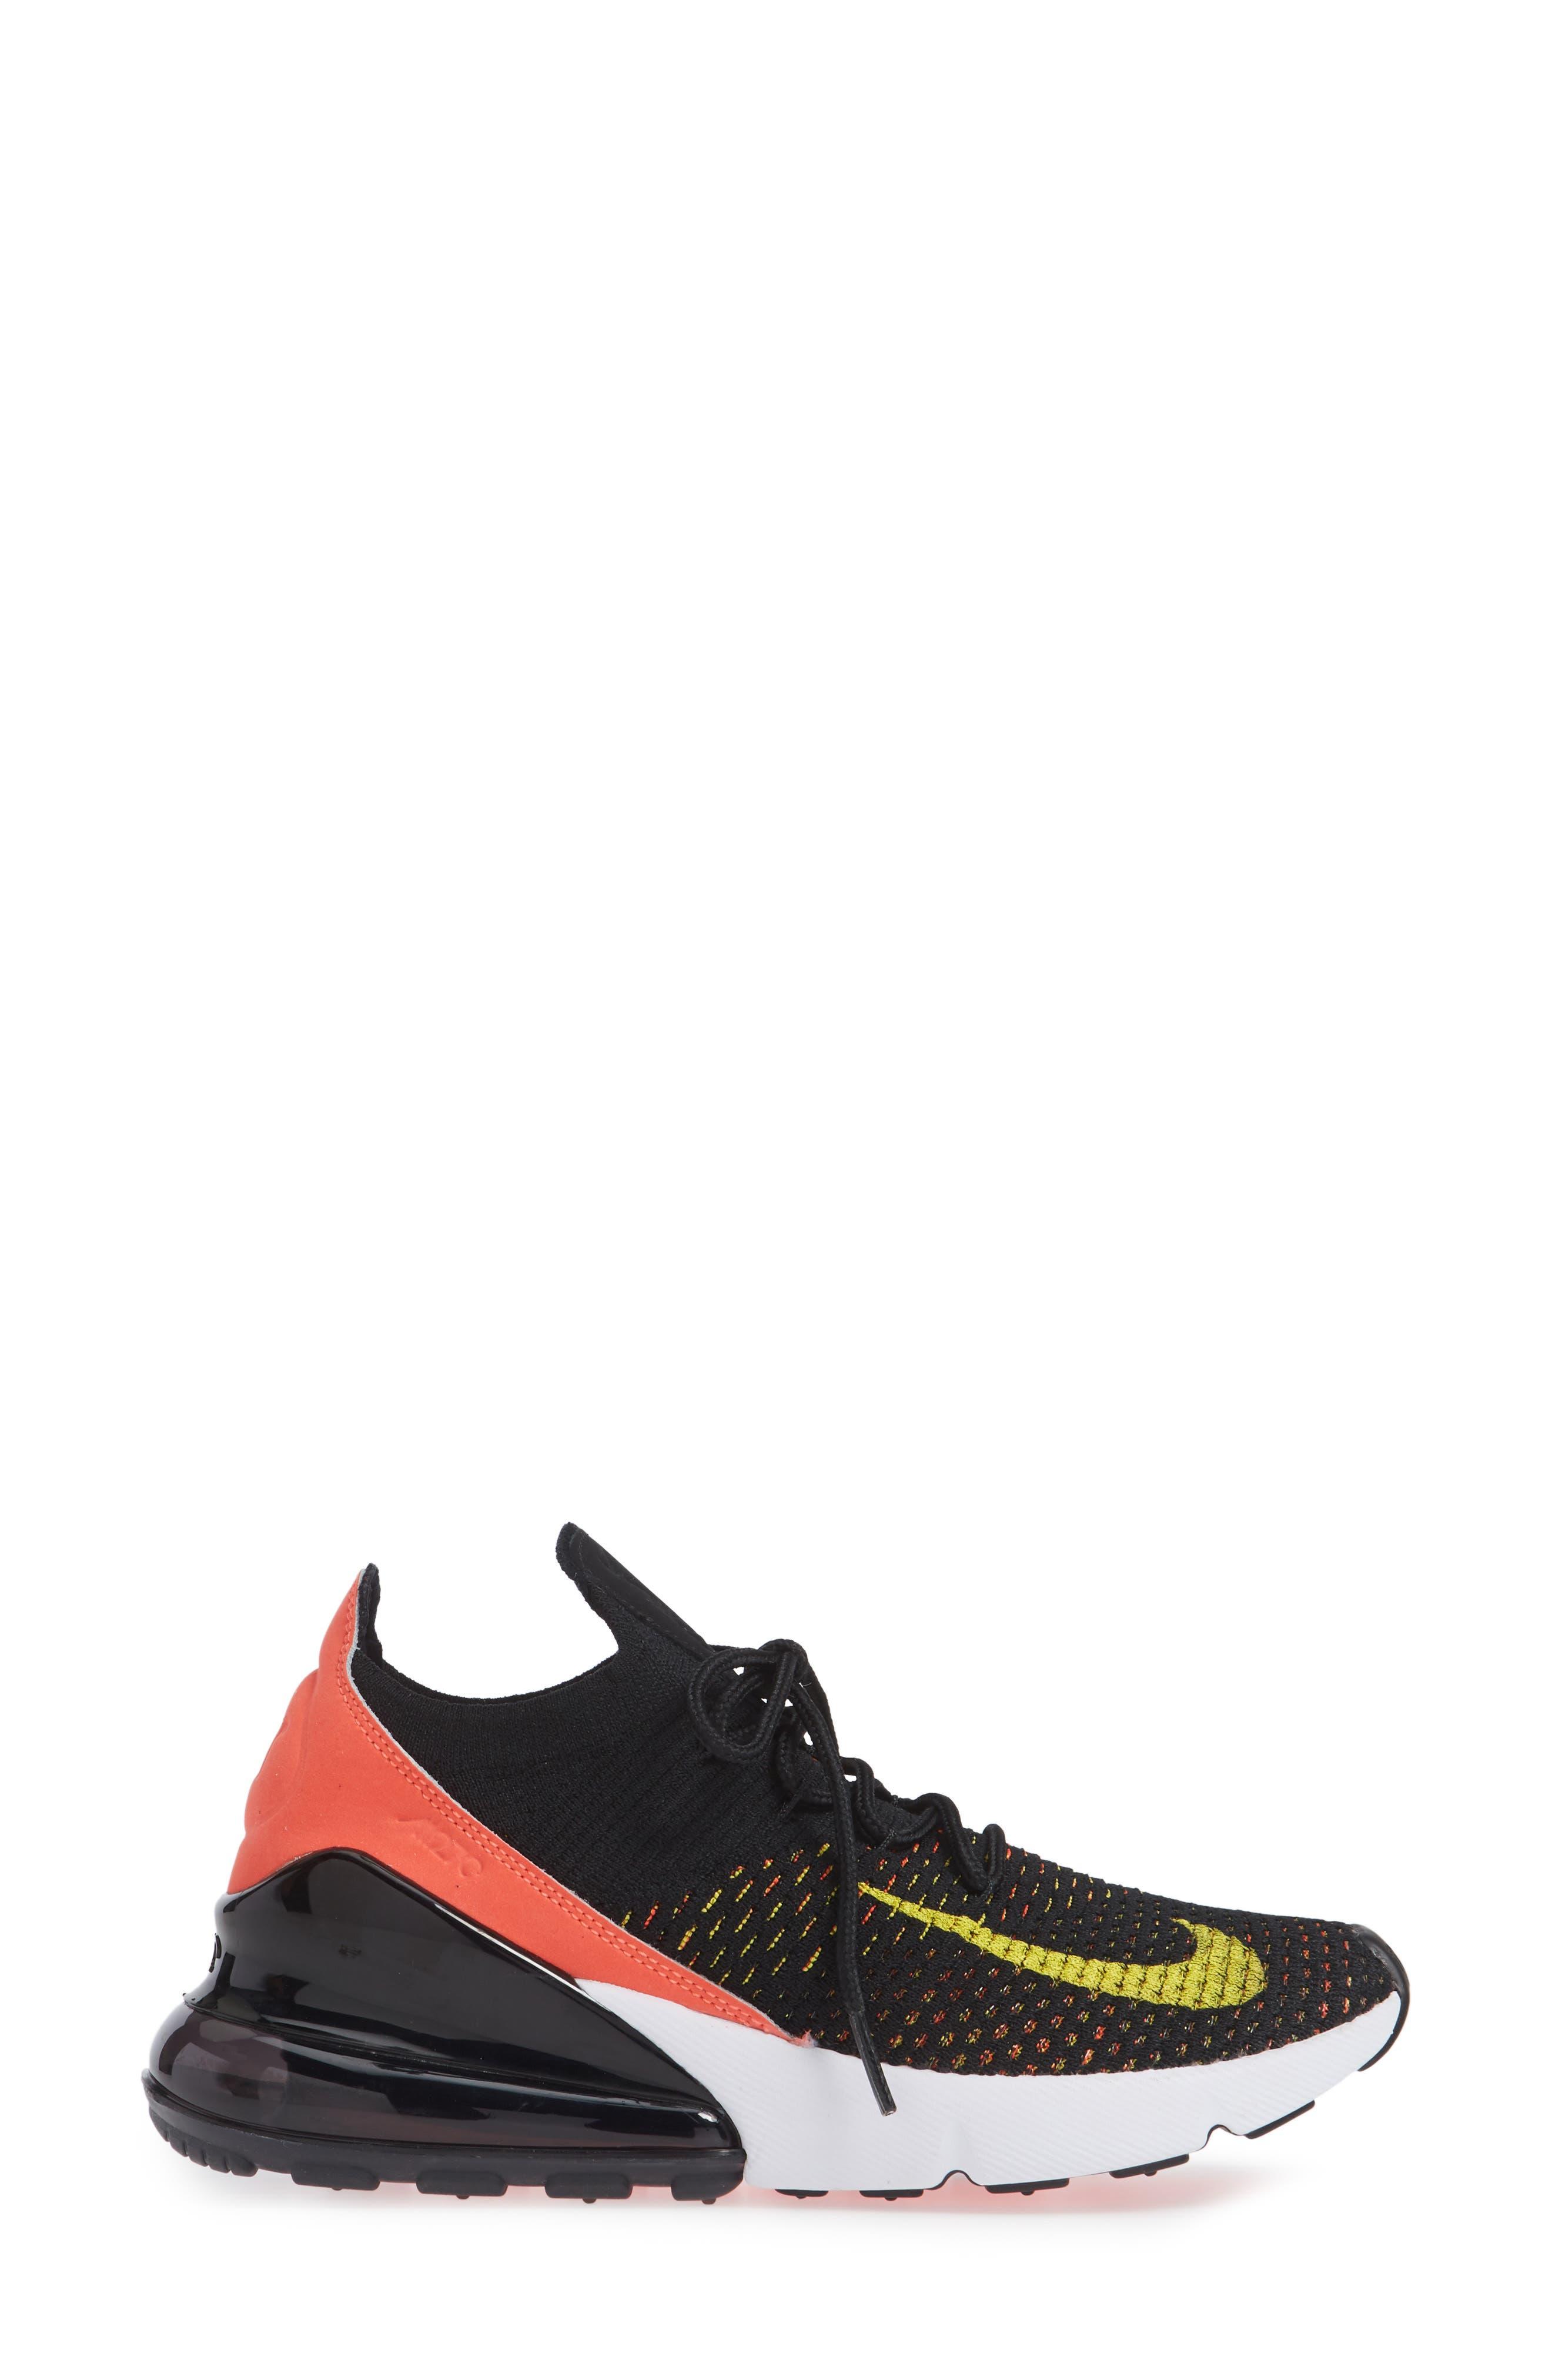 Air Max 270 Flyknit Sneaker,                             Alternate thumbnail 17, color,